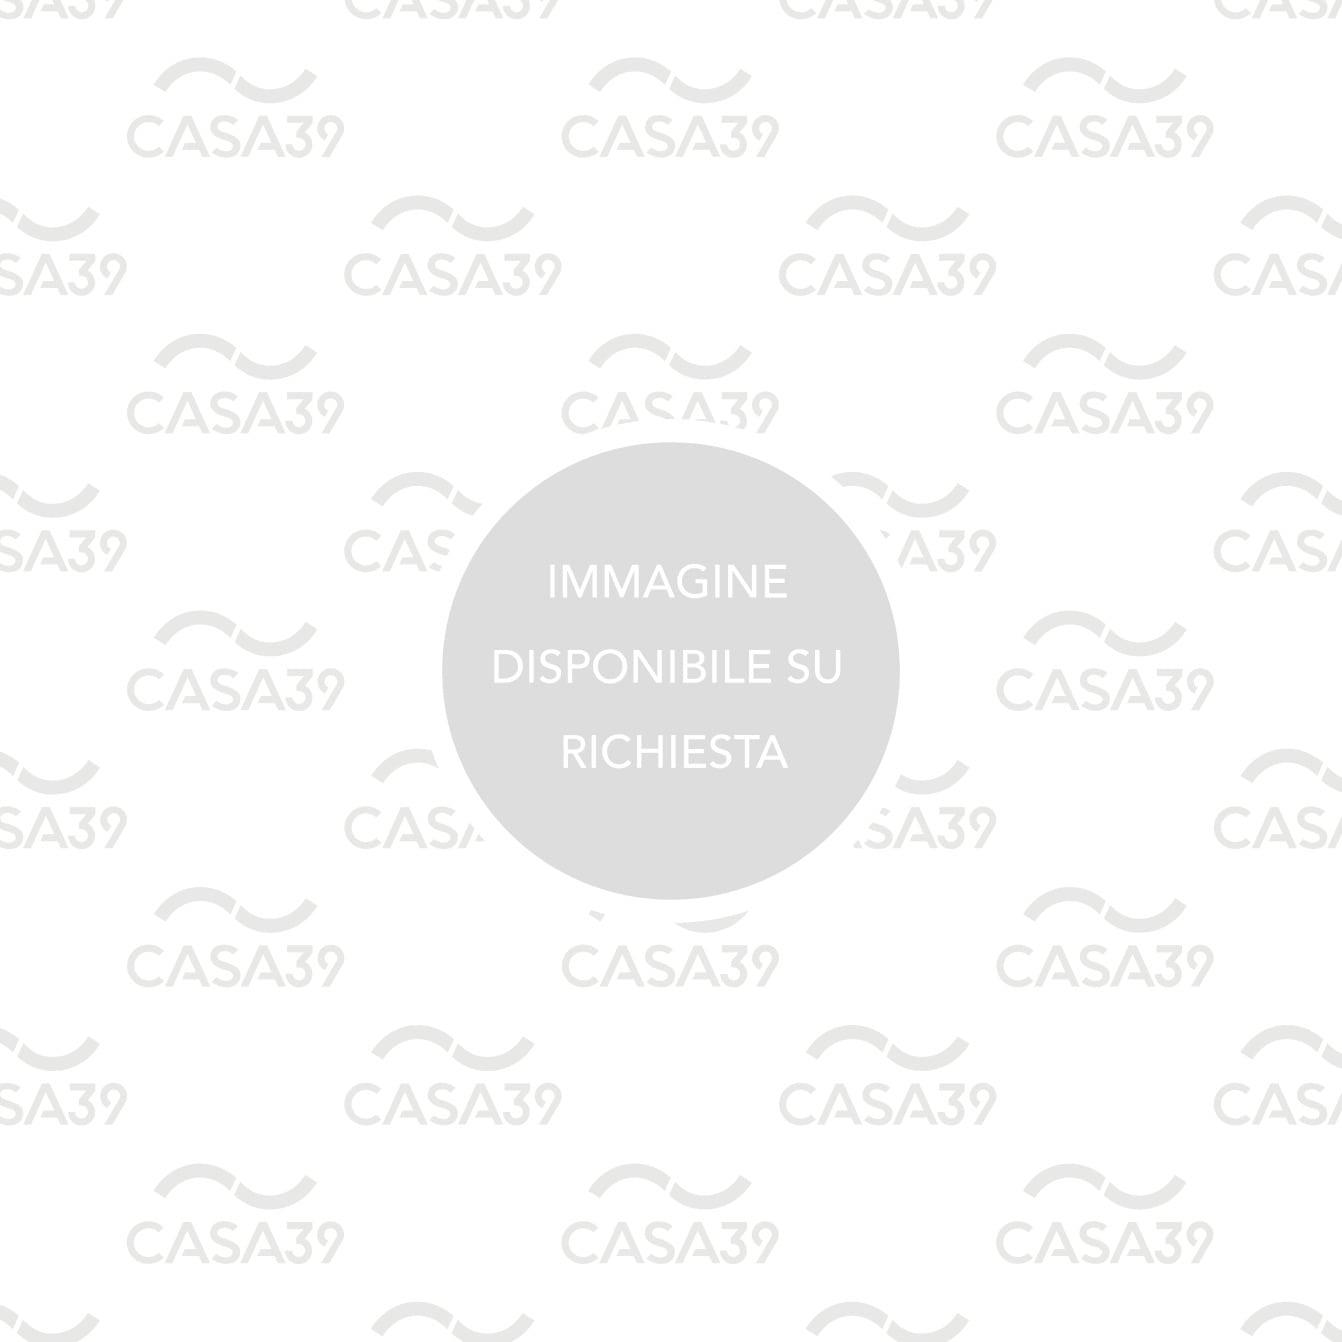 Stock piastrelle fine serie - Offerte | Casa39.it